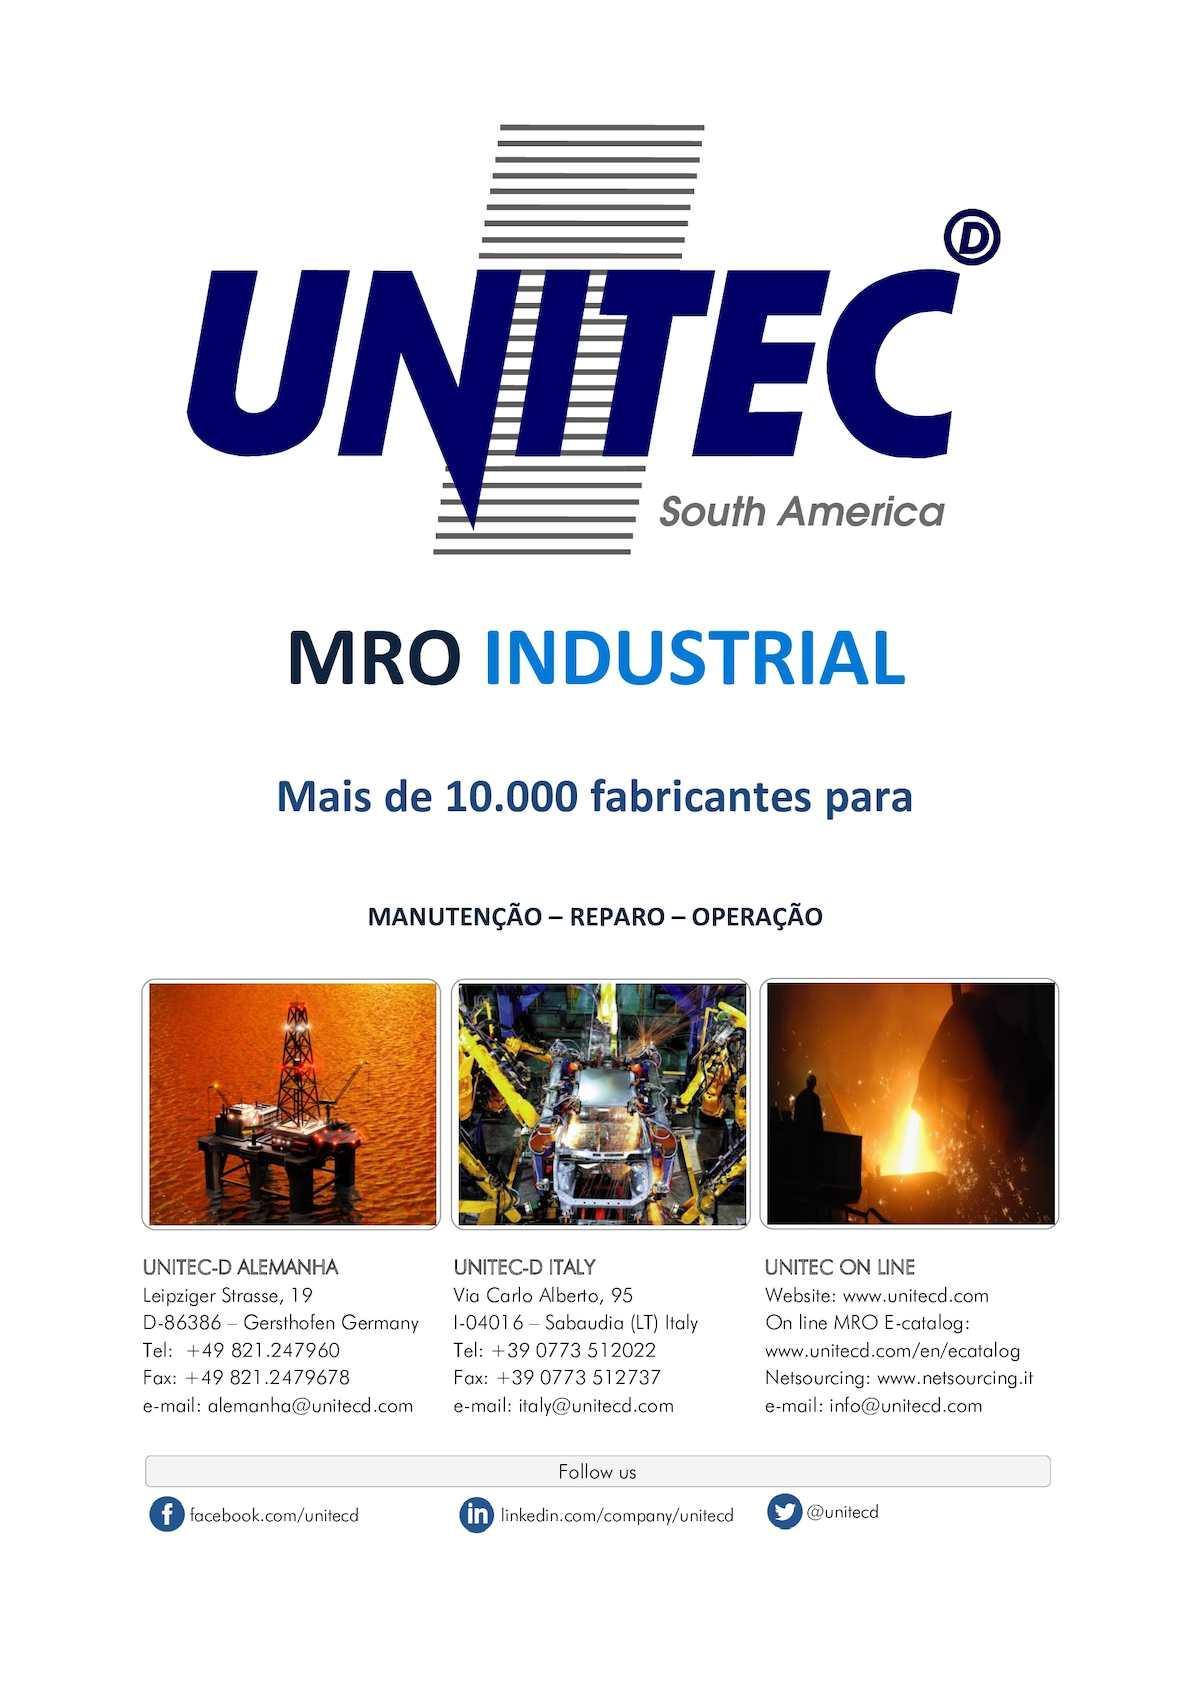 Wiring Diagram For Air Blower Calam 233 O Spareparts Mro Catalog Portuguese